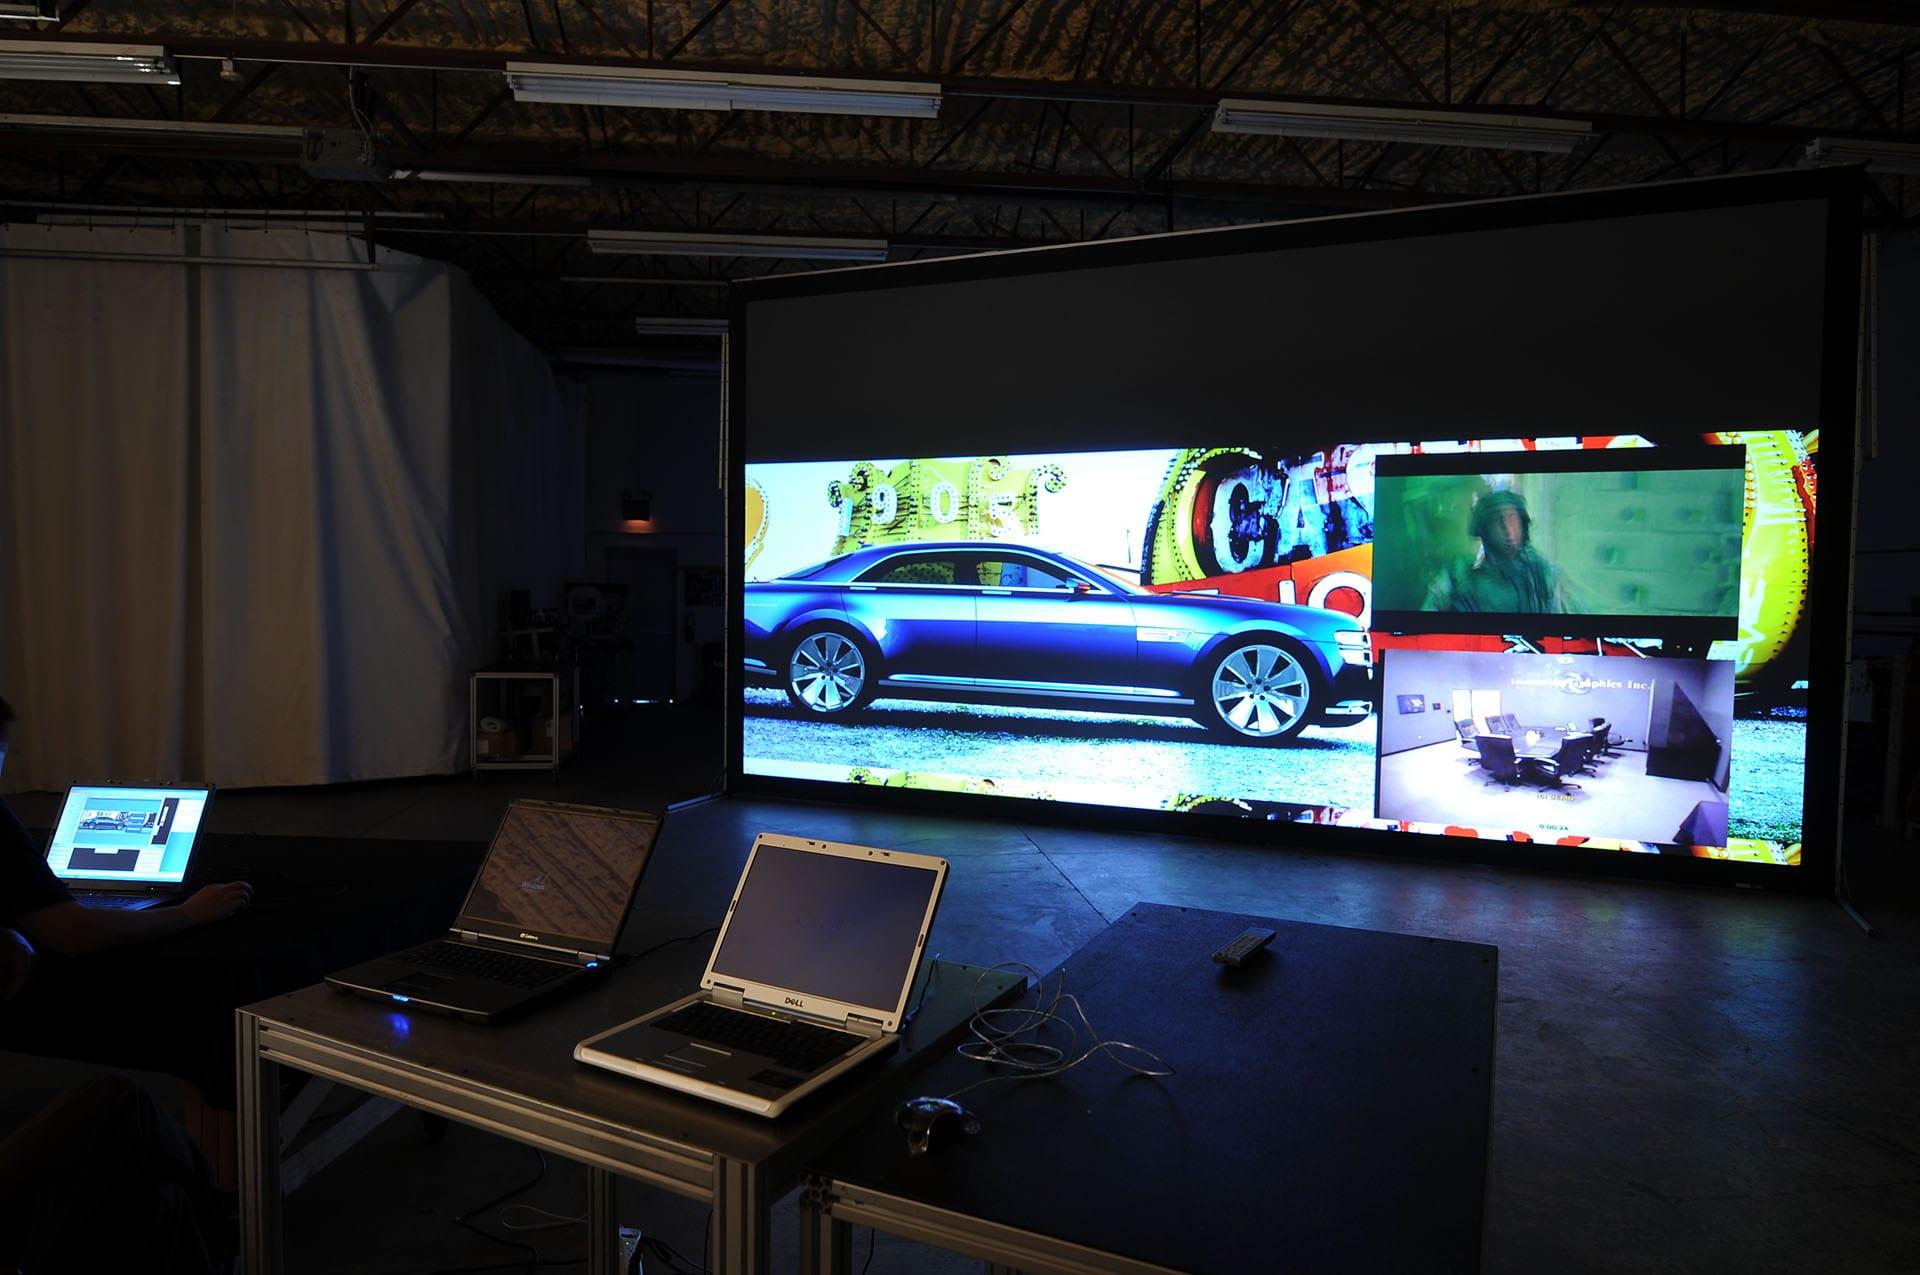 IGI 4K Forum 23' projection powerwall automotive render